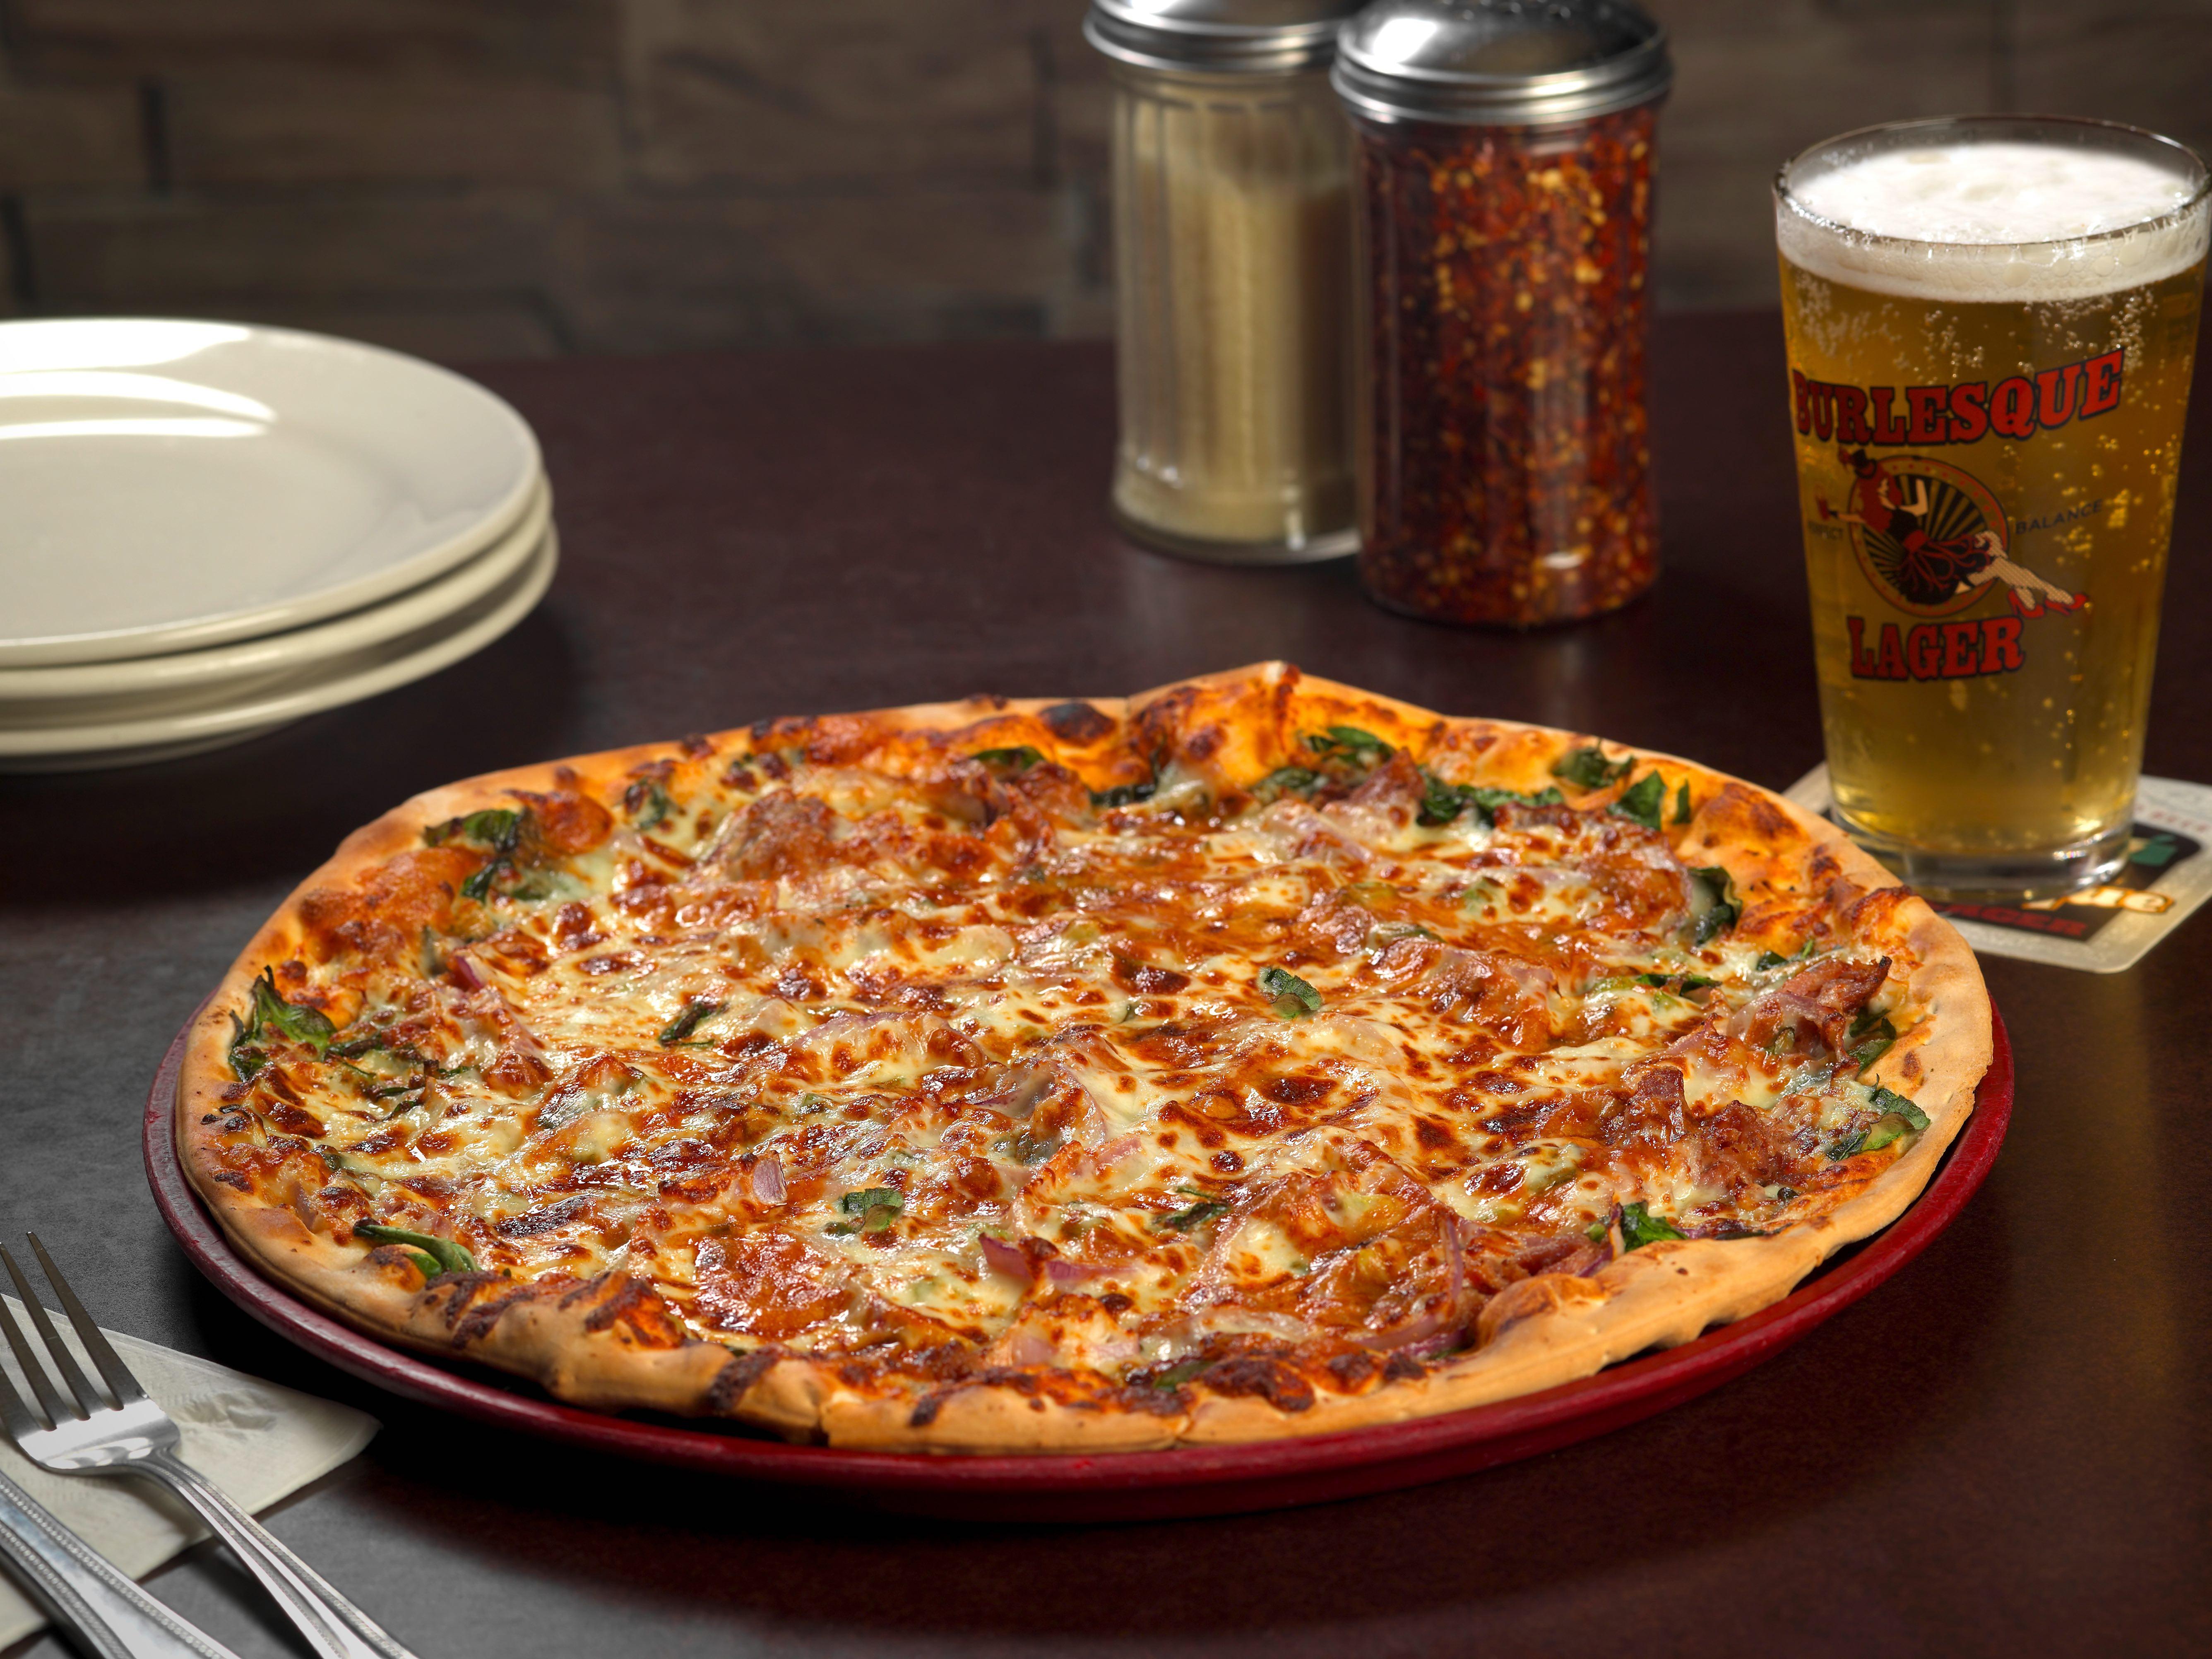 Minsky's Chouteau Grand 20th Anniversary Gourmet Pizza